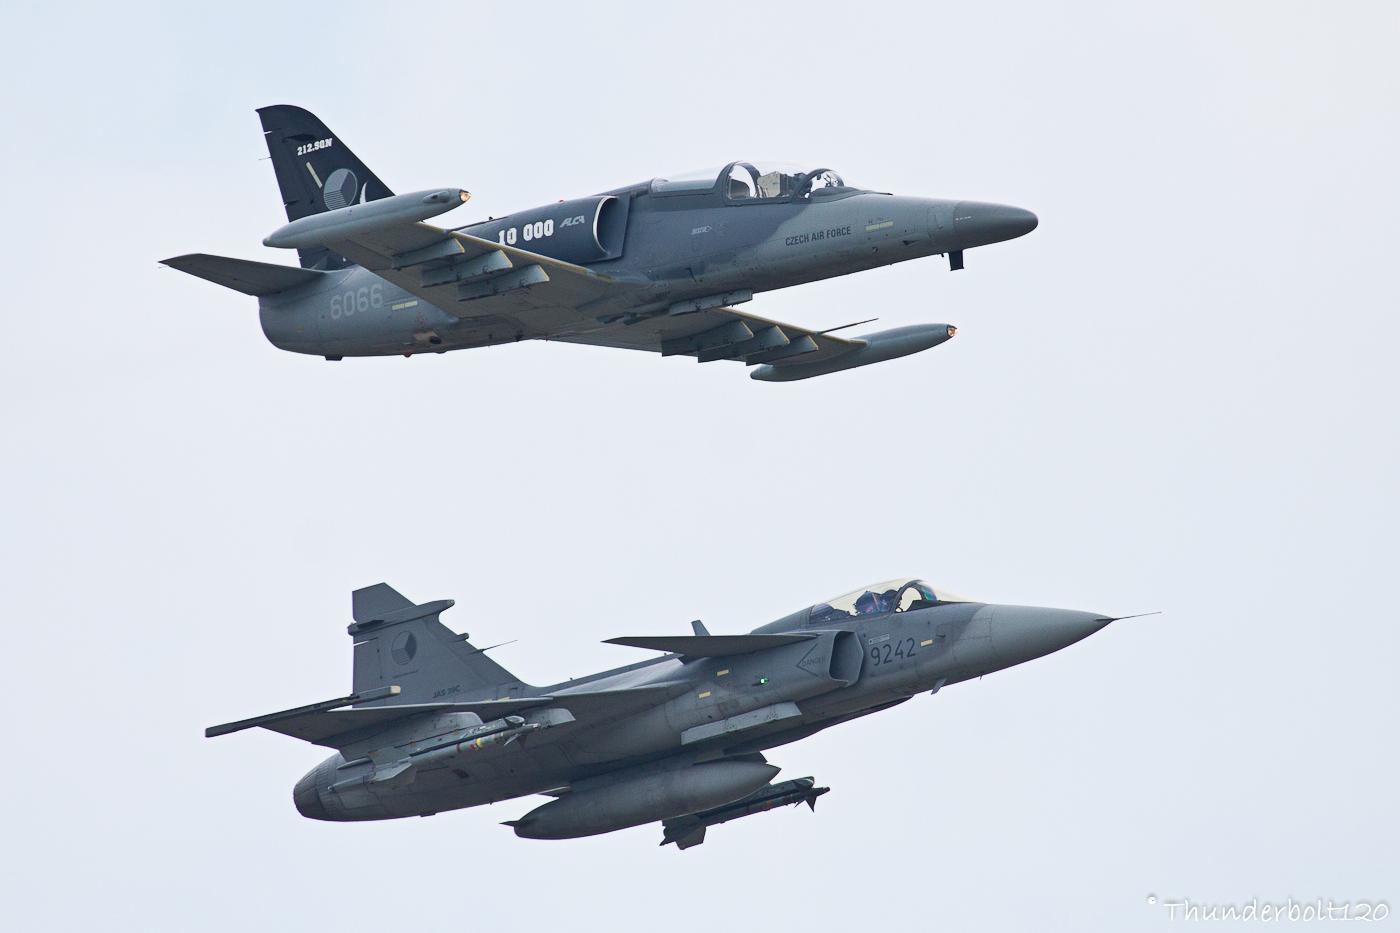 L-159A ALCA and JAS-39C Gripen